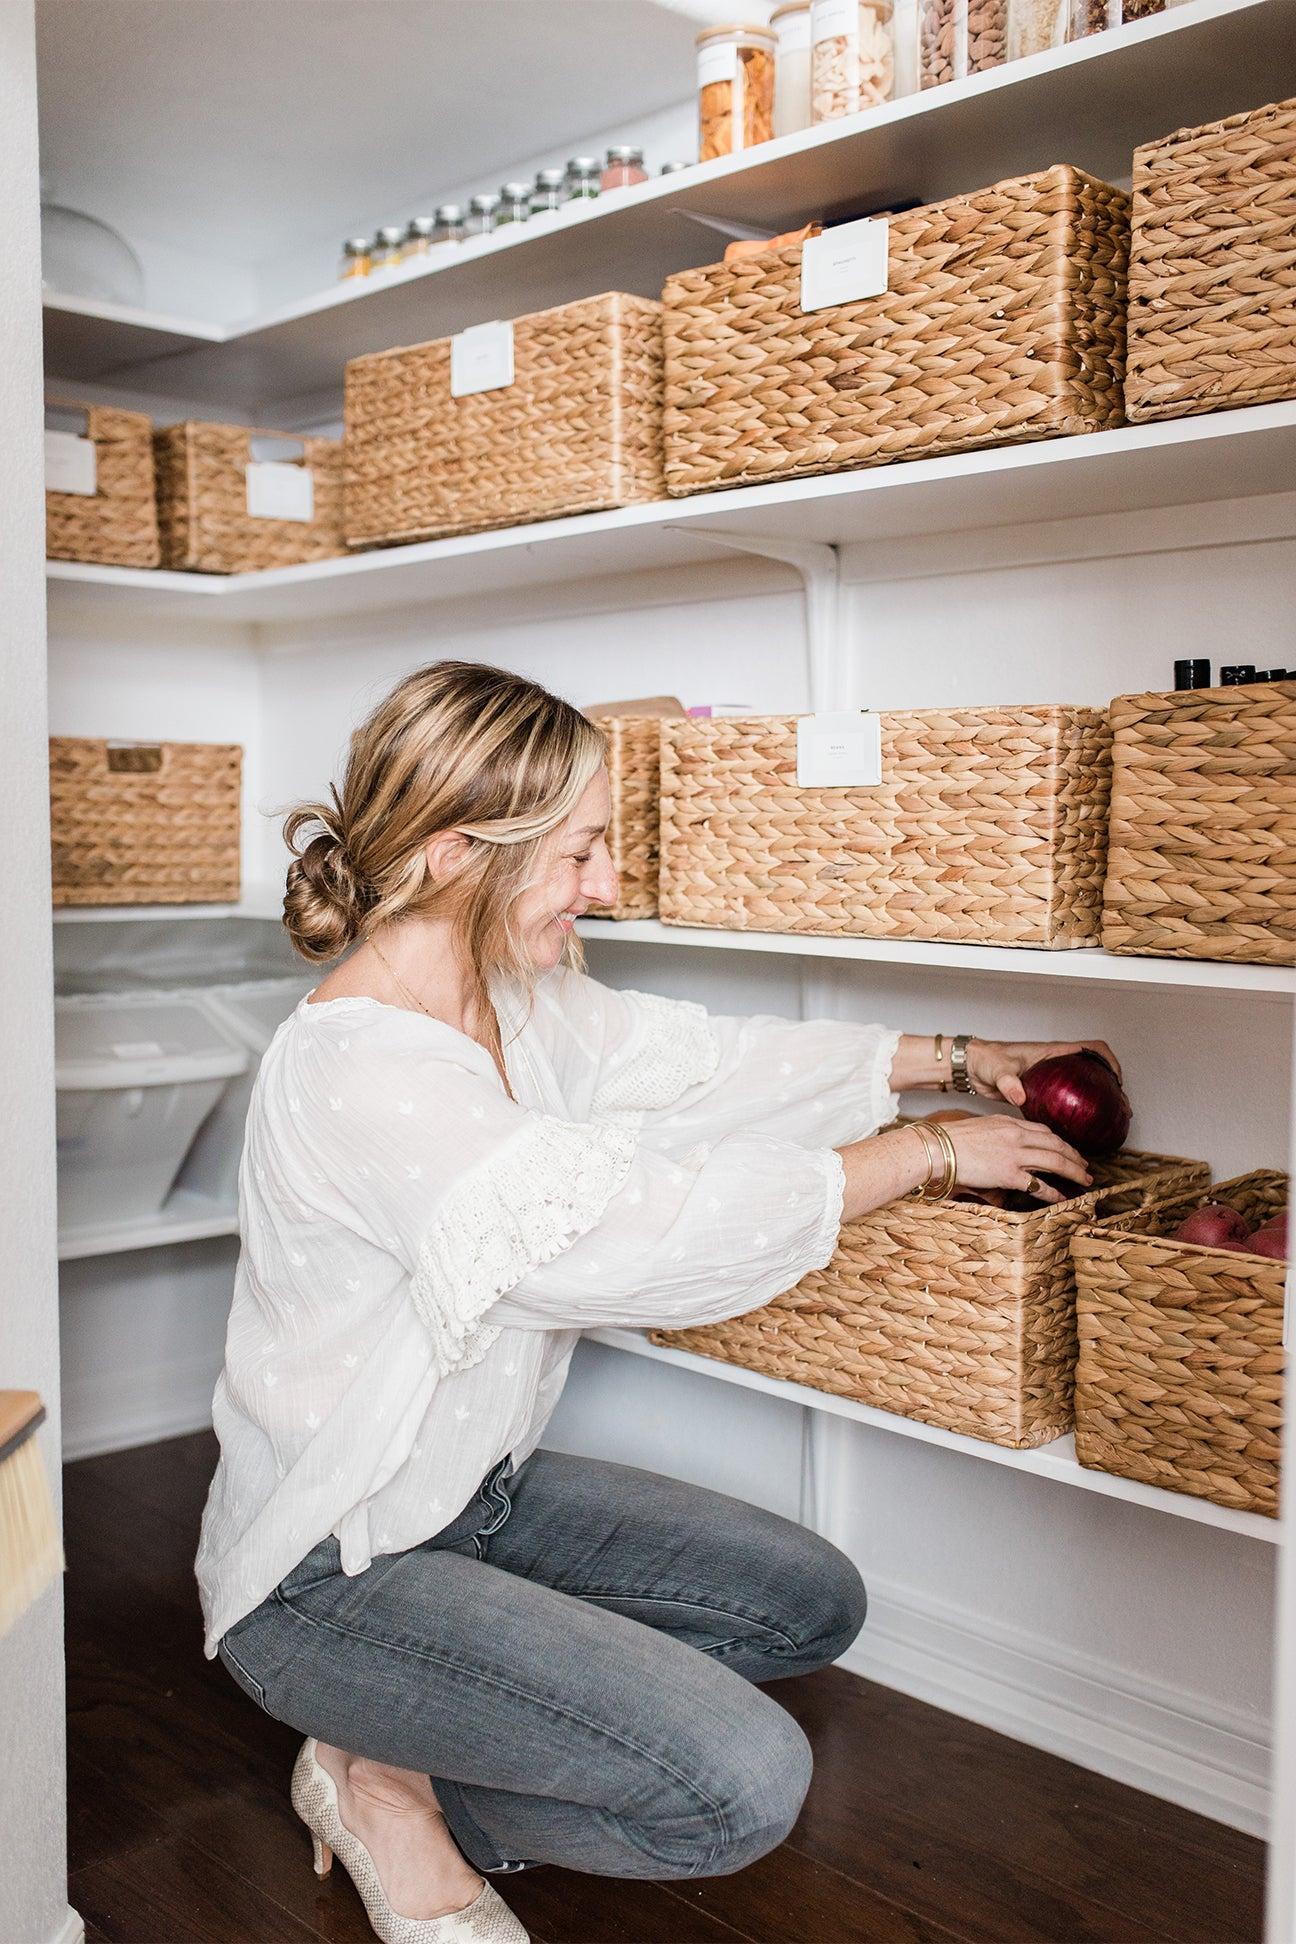 Shira gill organizing a pantry